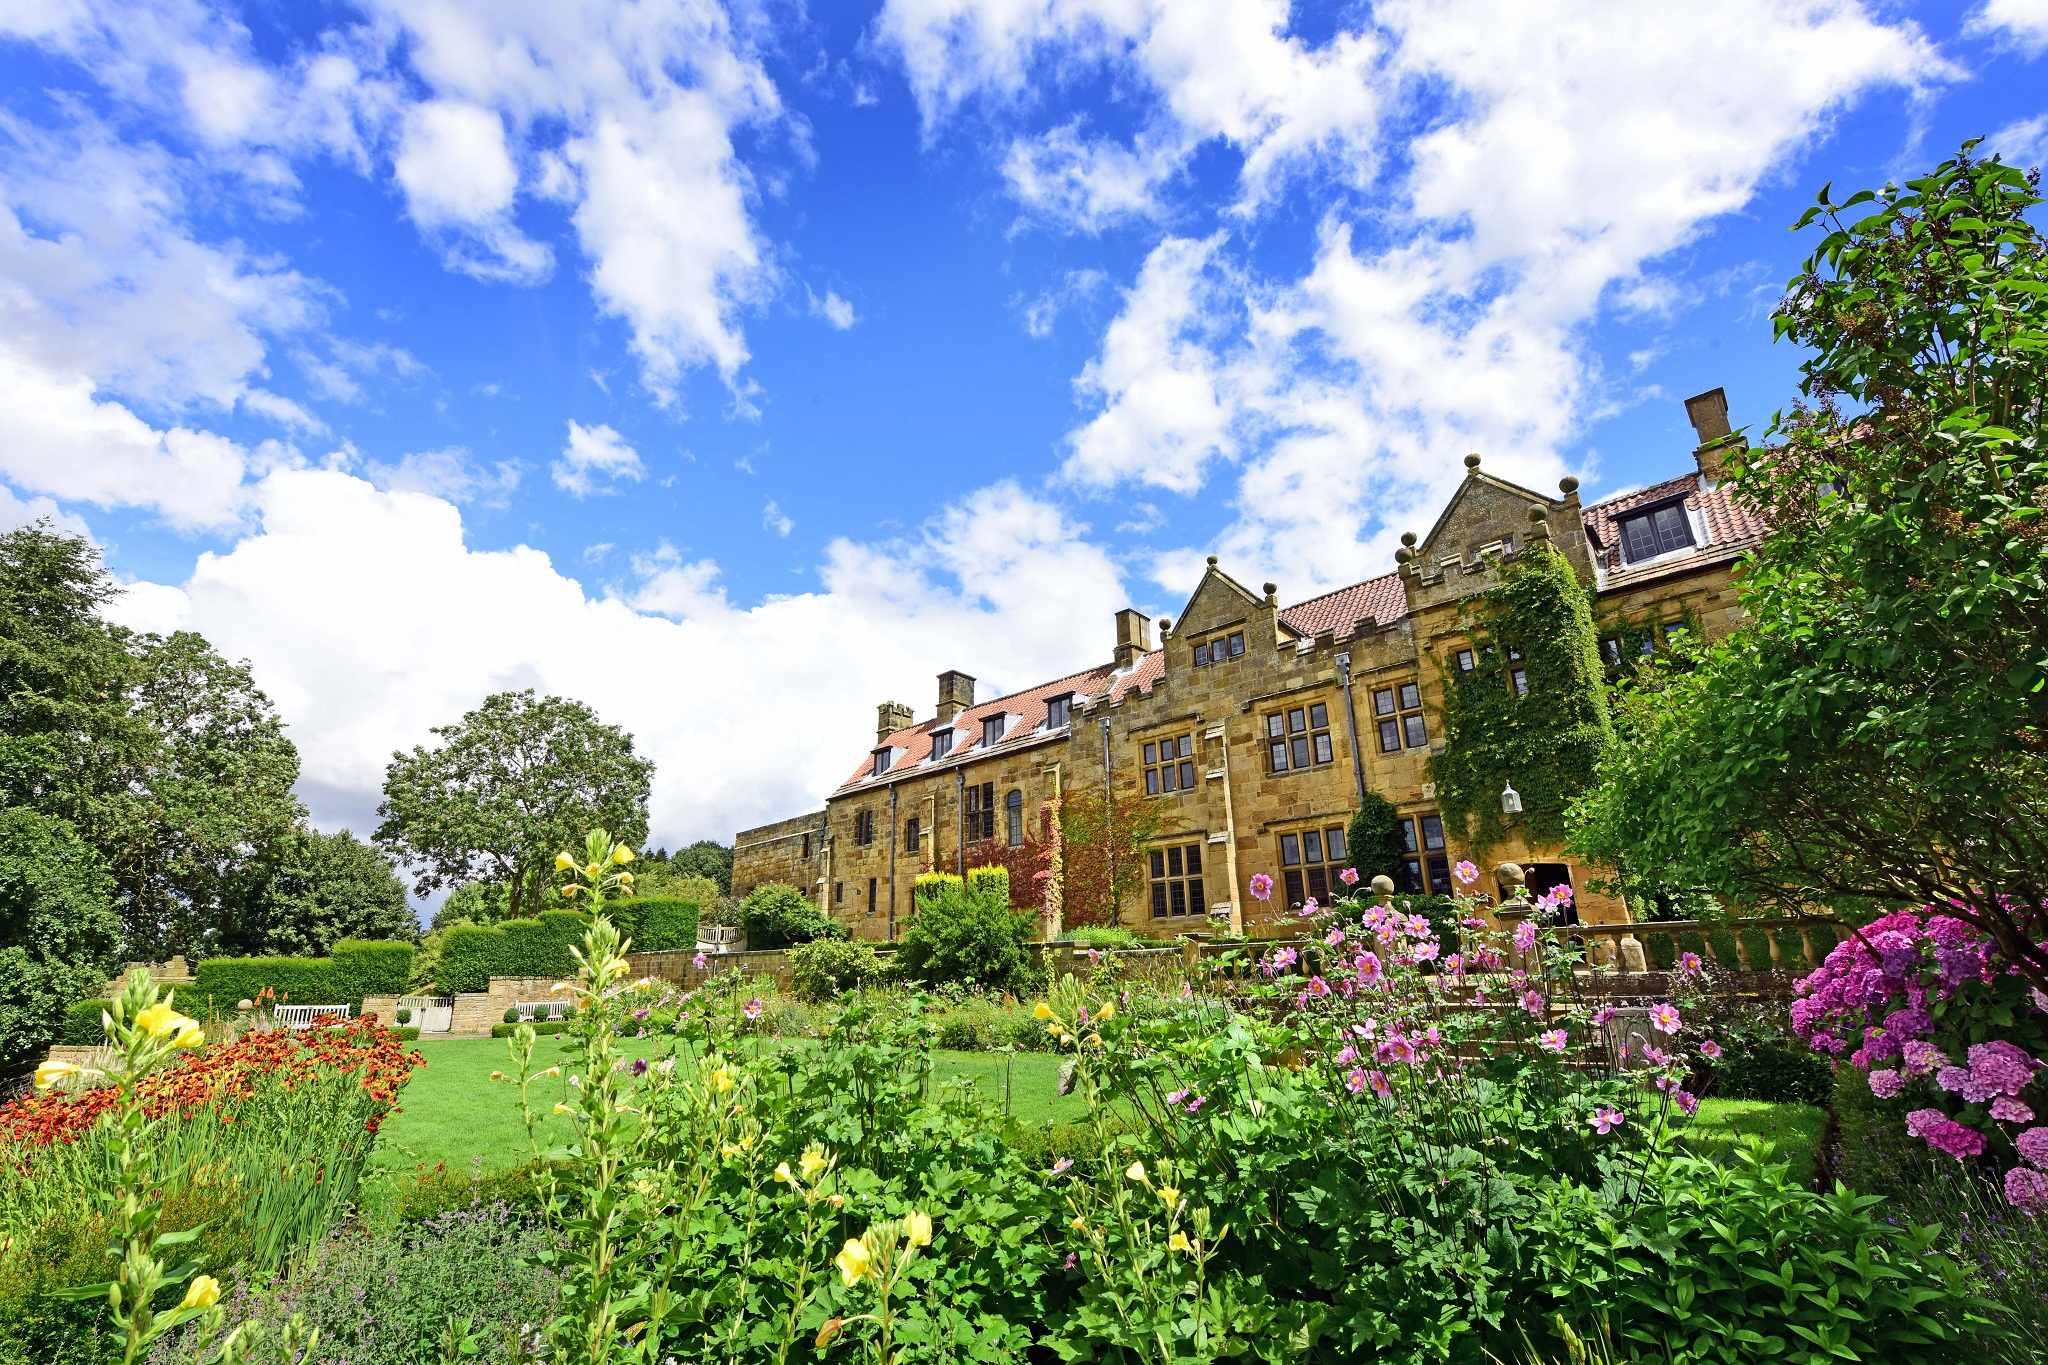 Mount Grace Priory